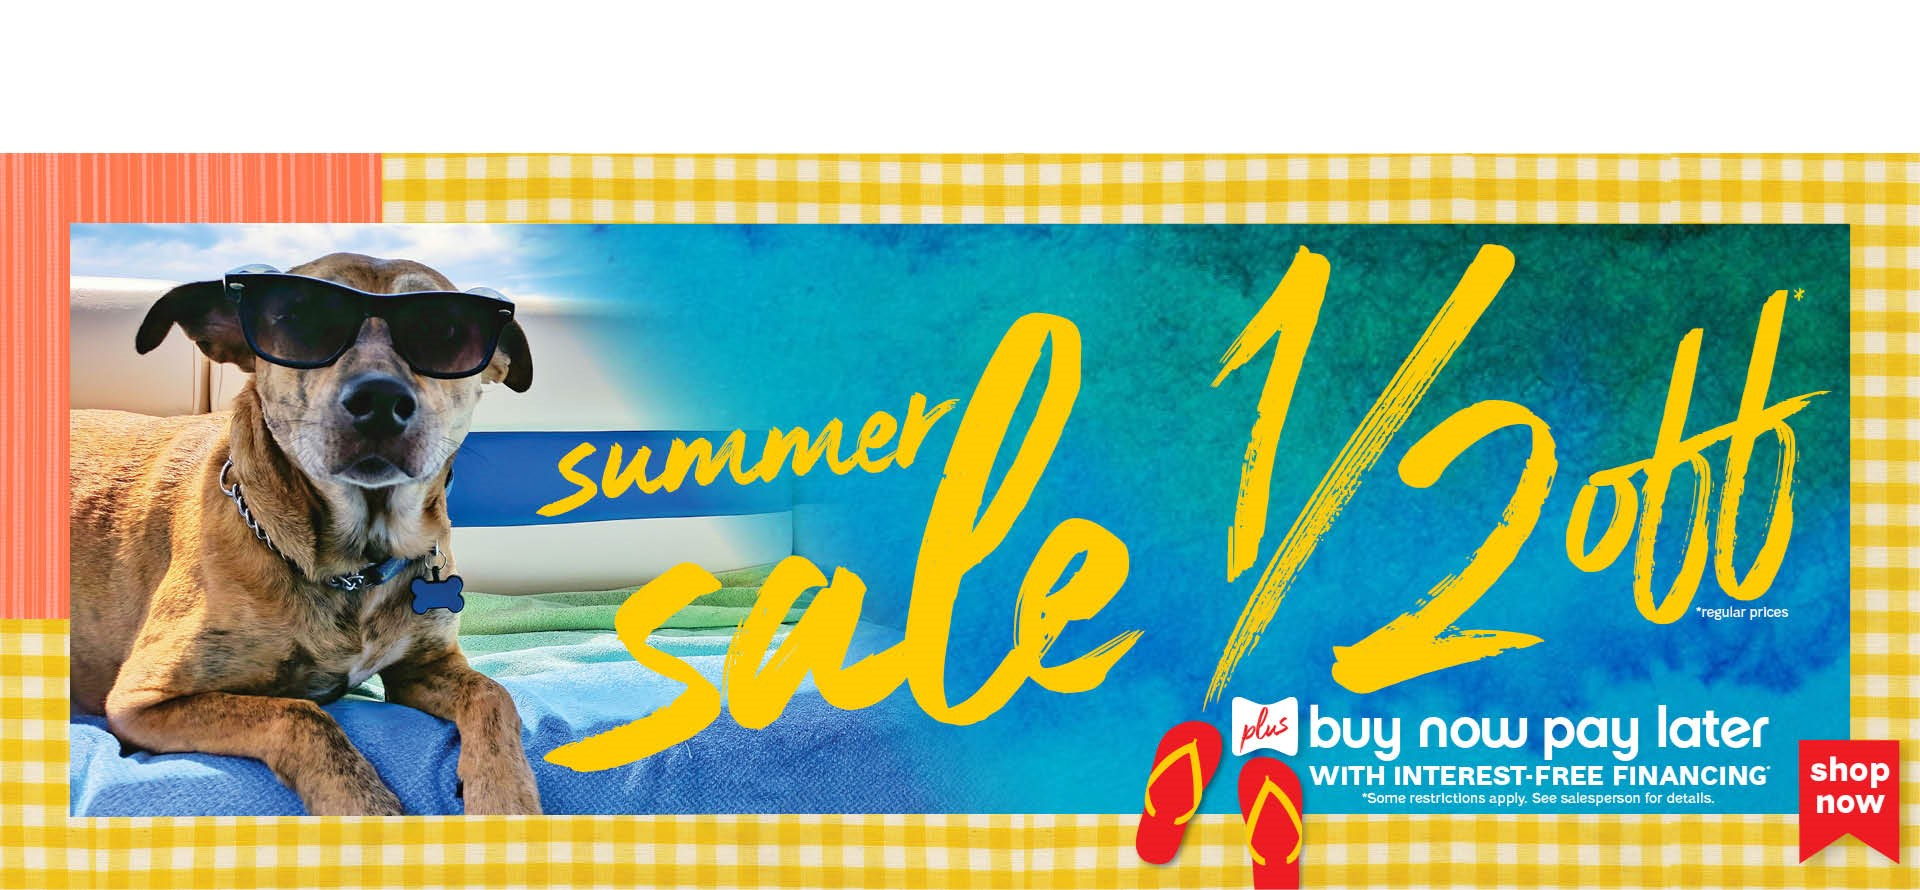 half off summer sale